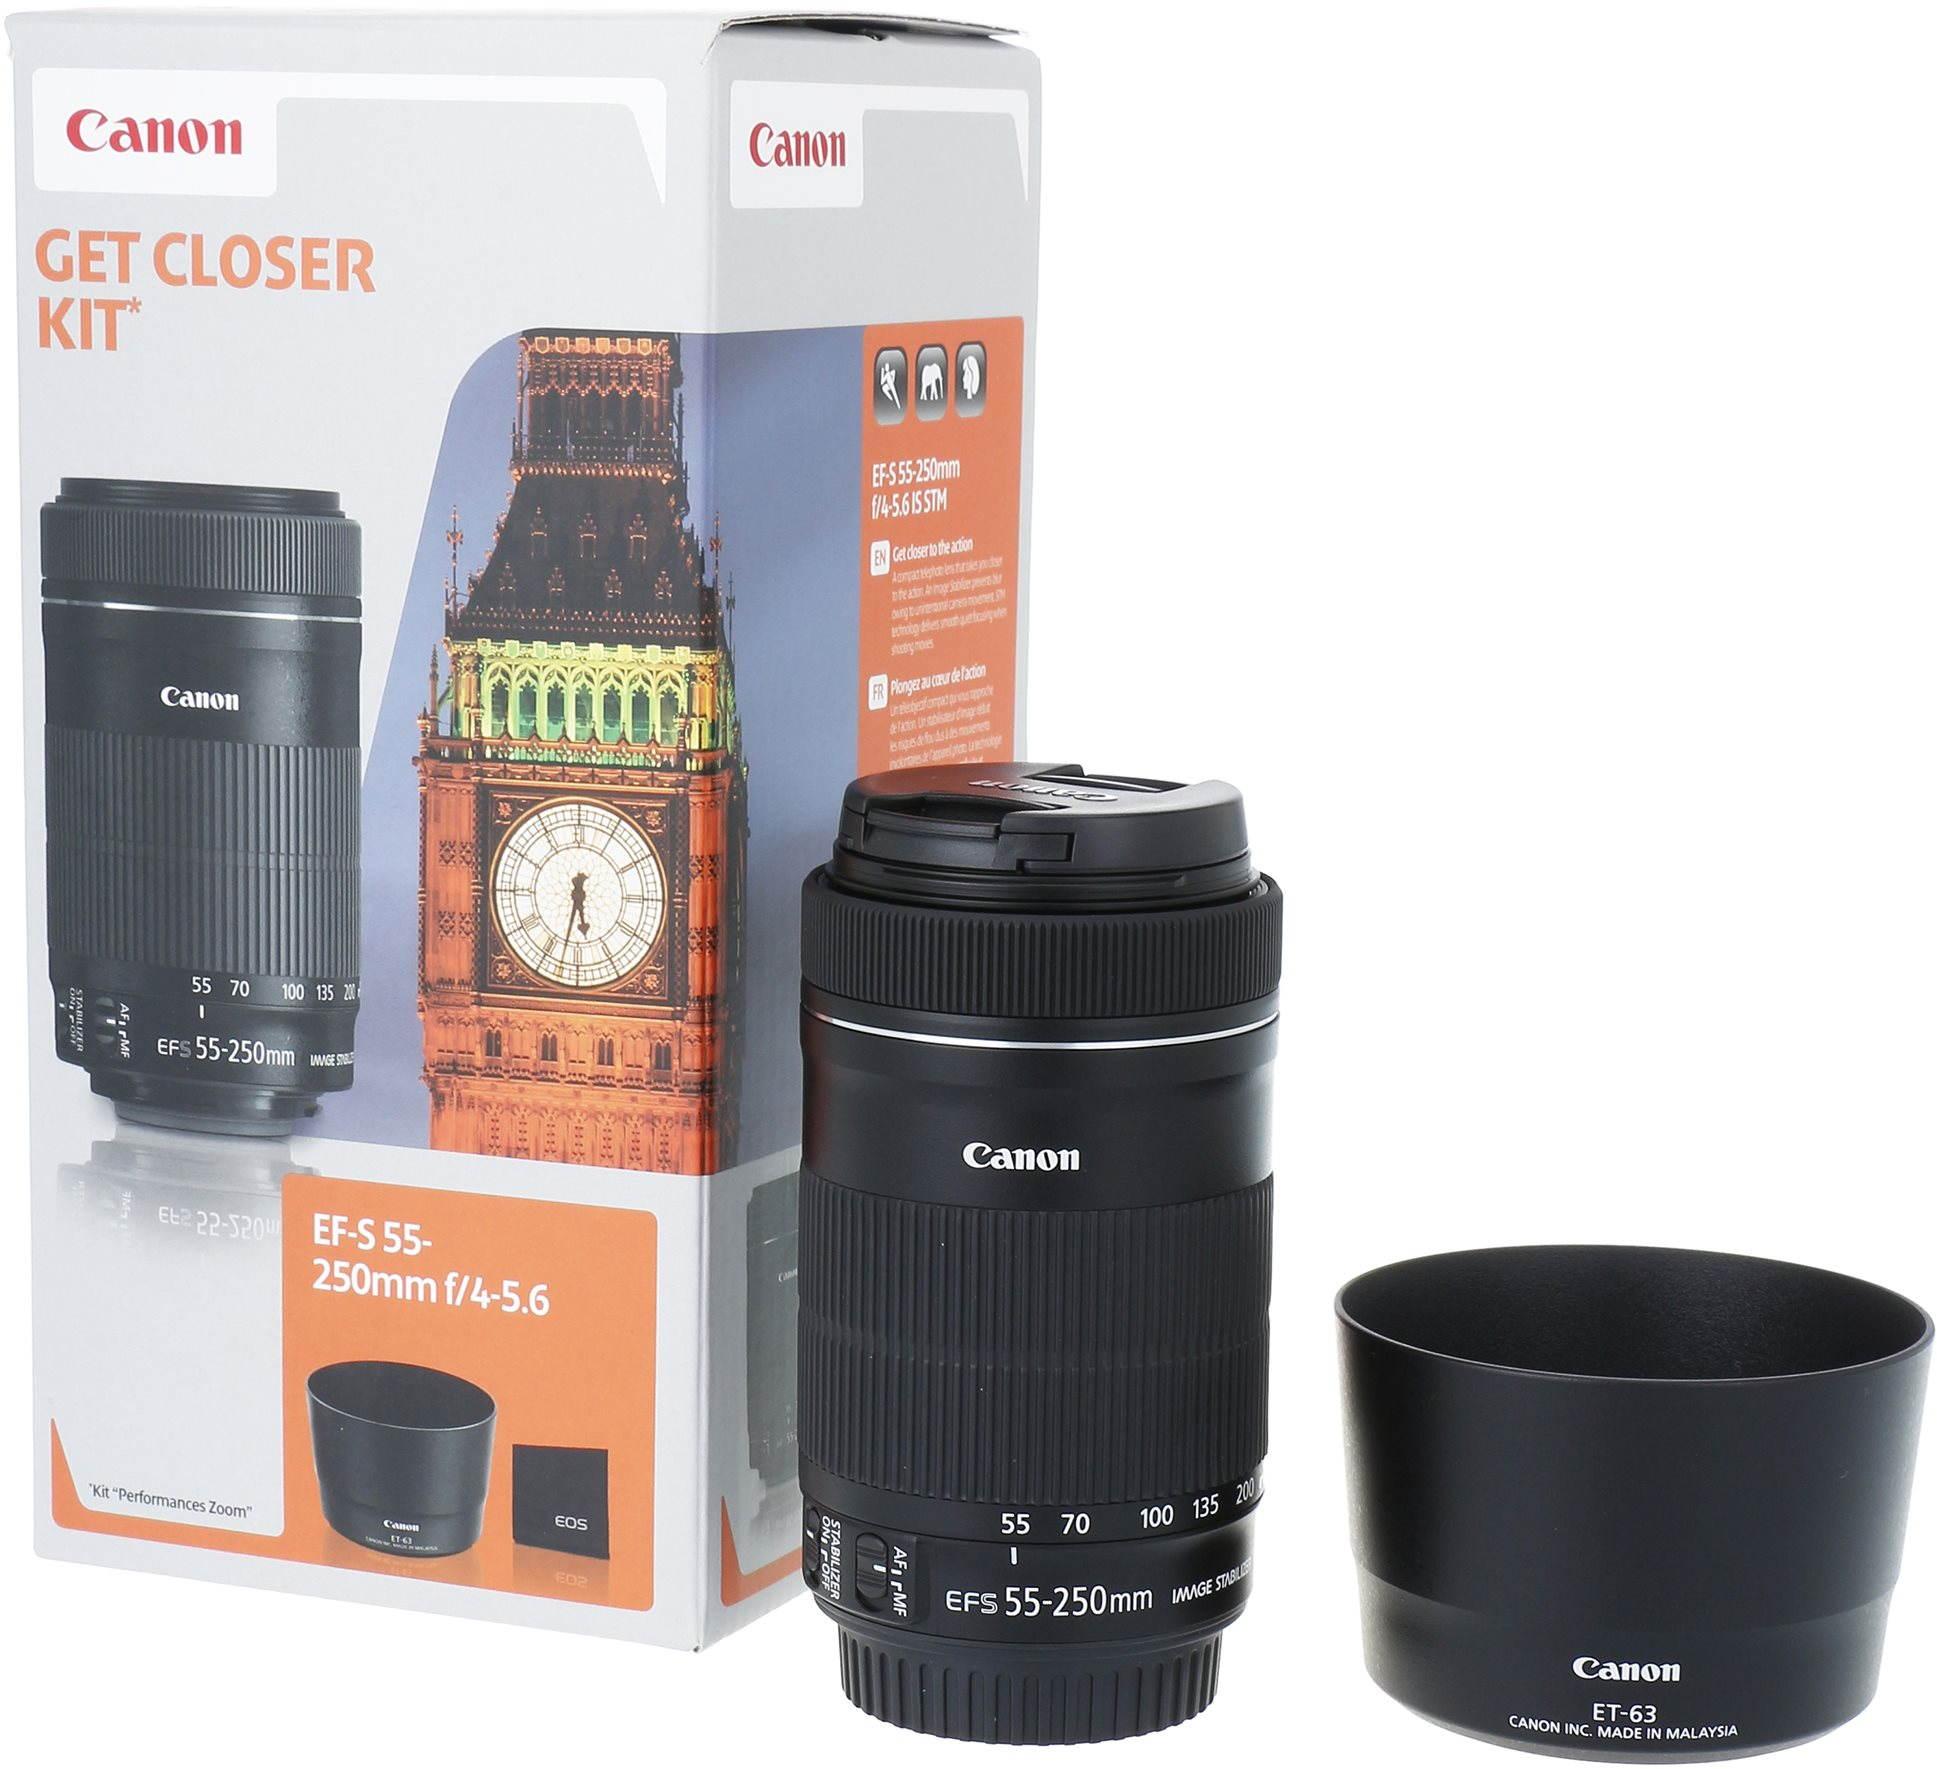 Canon EF-S 55-250mm F4.0 - 5.6 IS STM + ET-63